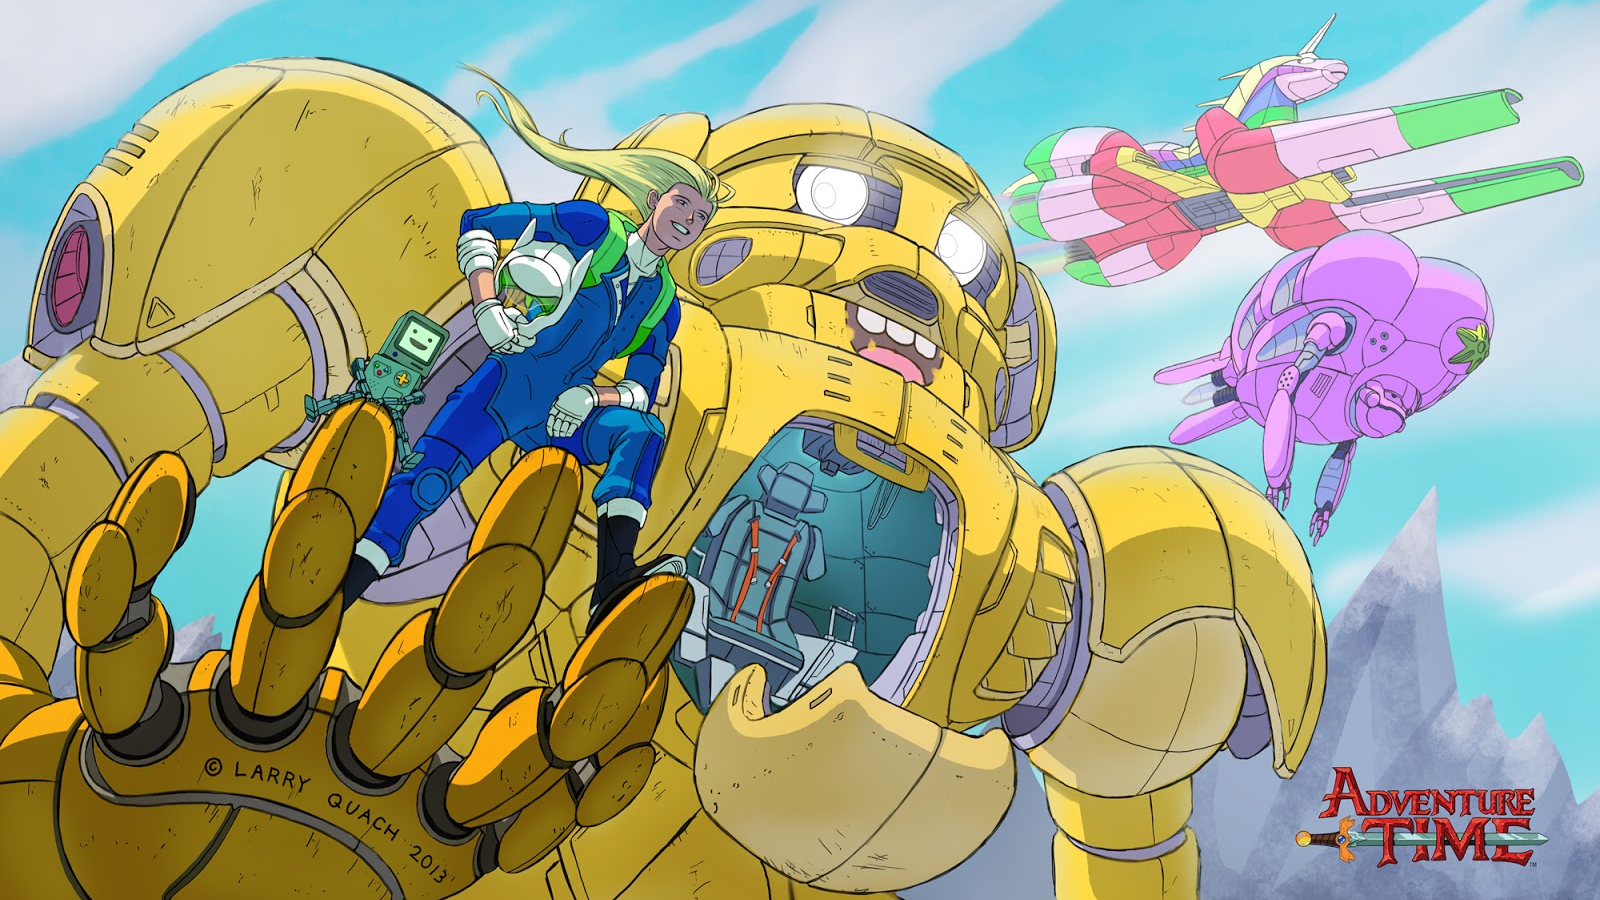 Free Download Geek Art Gallery Fresh Take Adventure Time